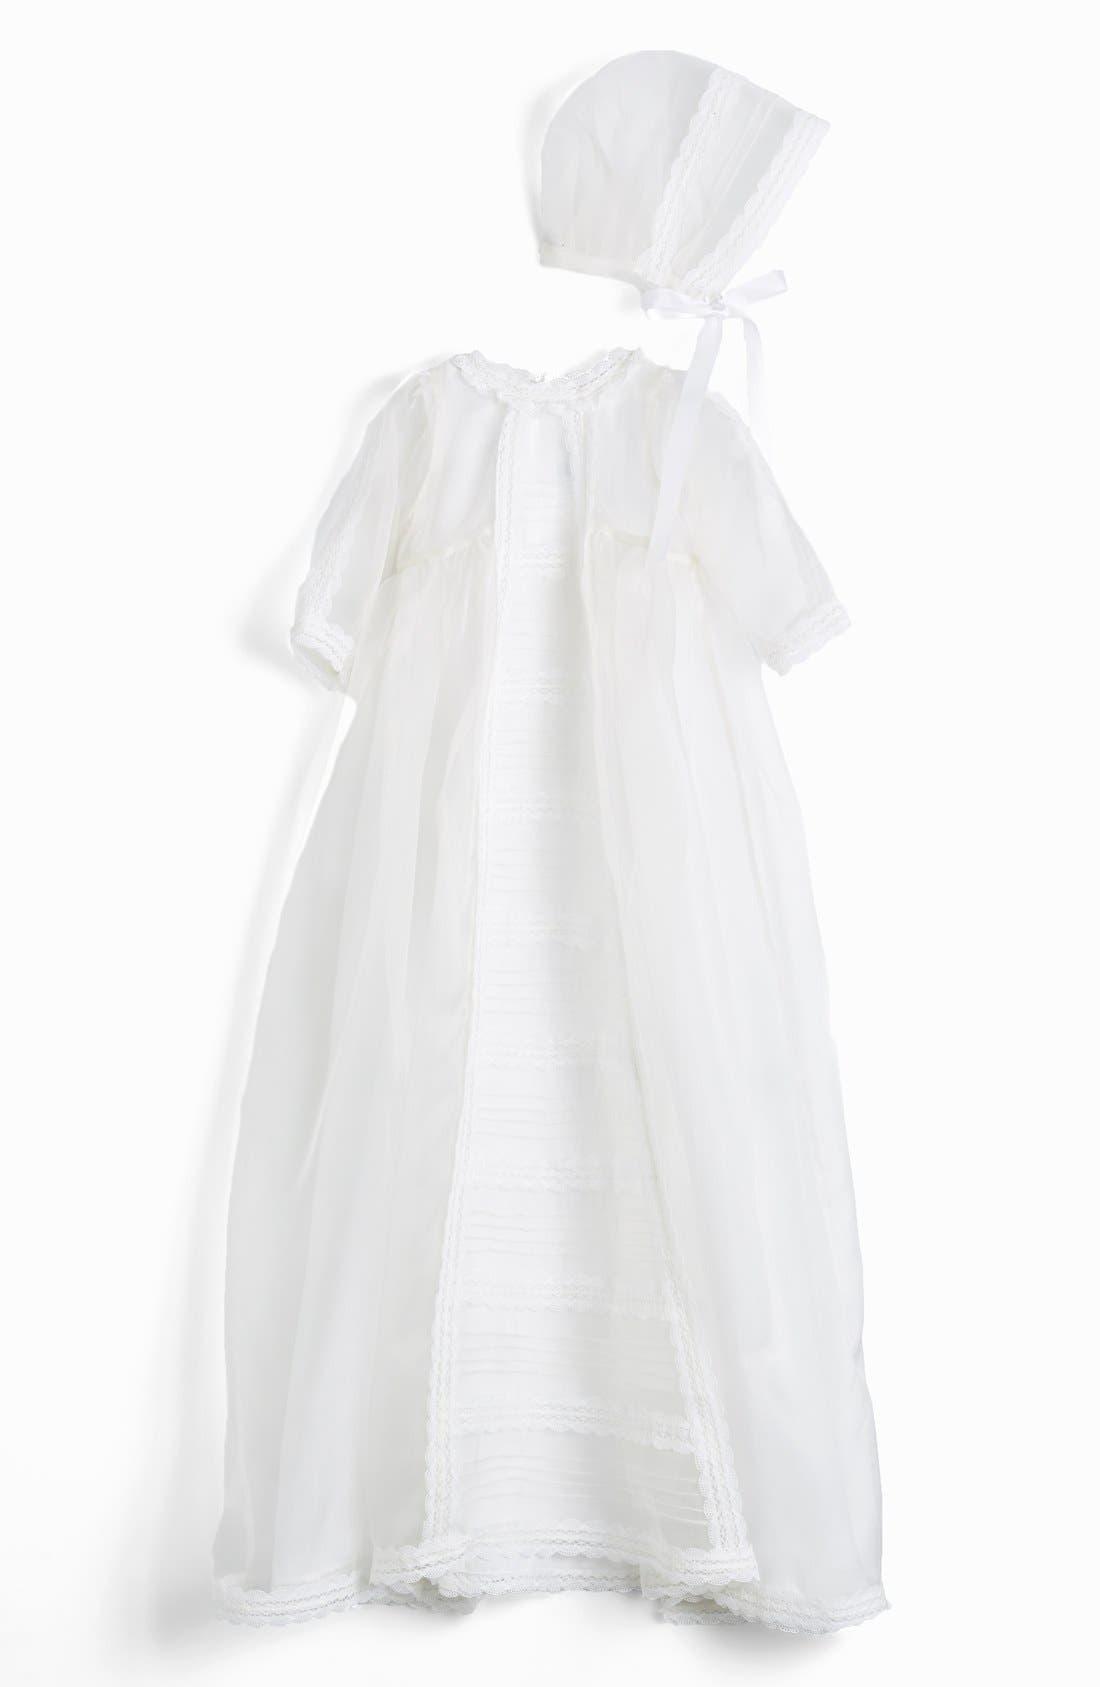 ISABEL GARRETON 'Caress' Silk Organza Christening Gown &